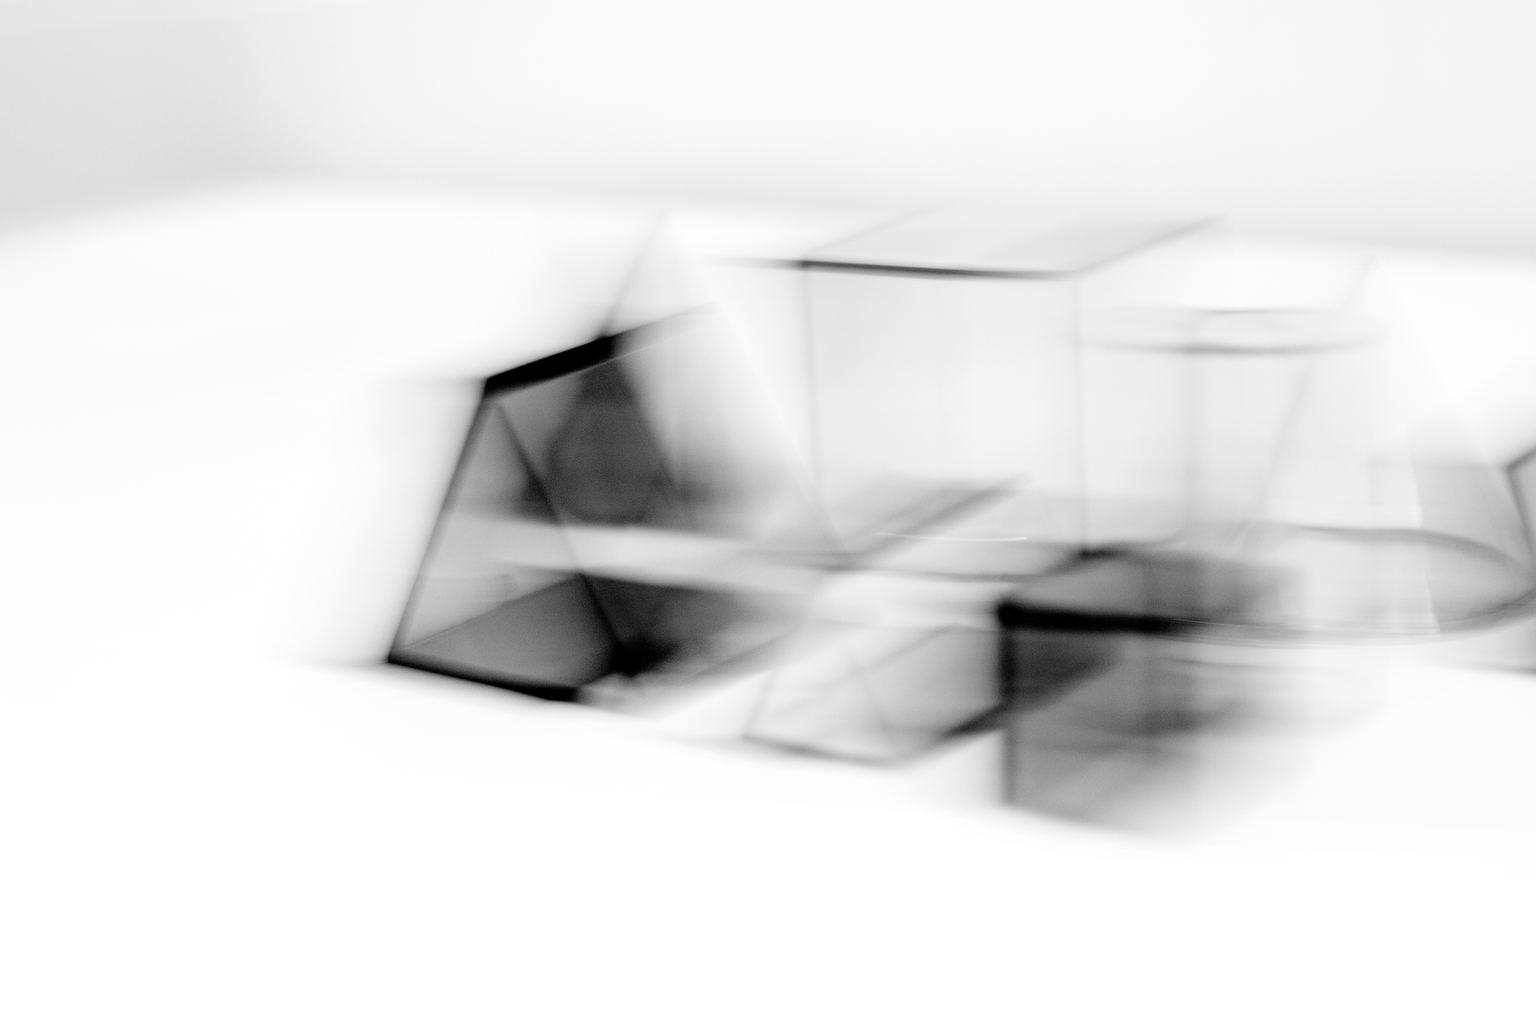 Fotografía abstracta difusa